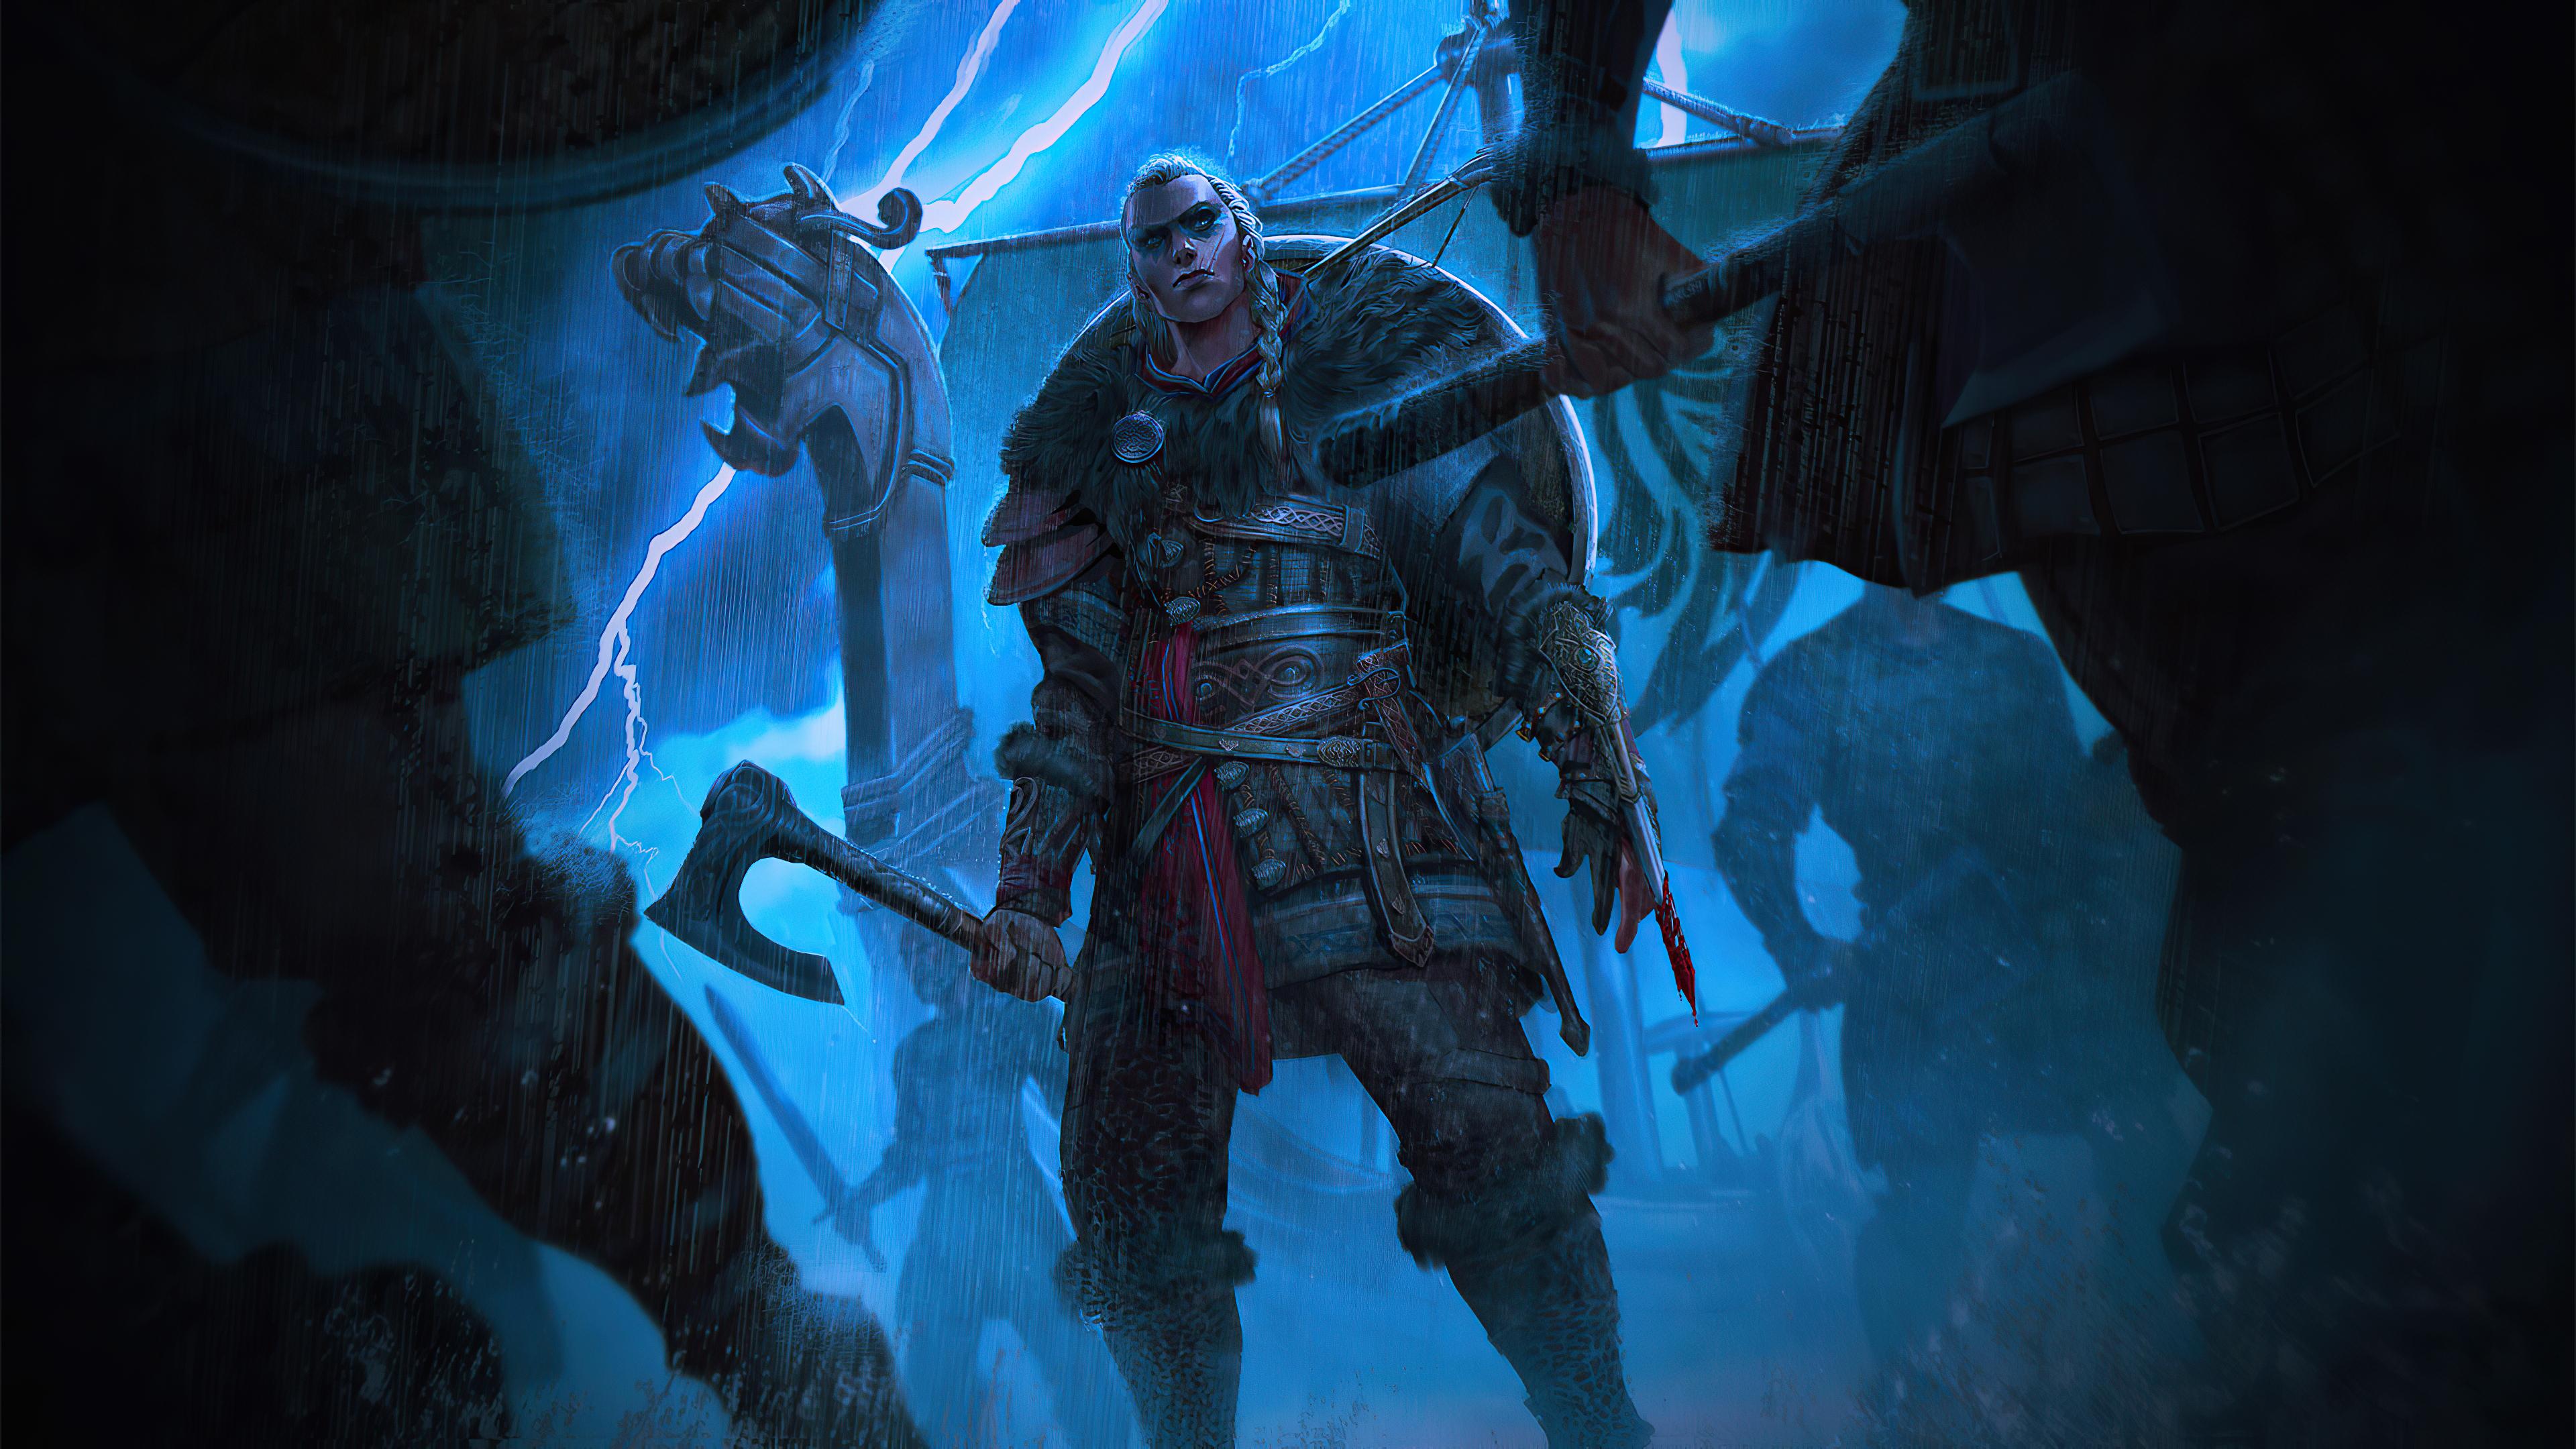 Lady Eivor From Assassins Creed Valhalla 4k Hd Games 4k